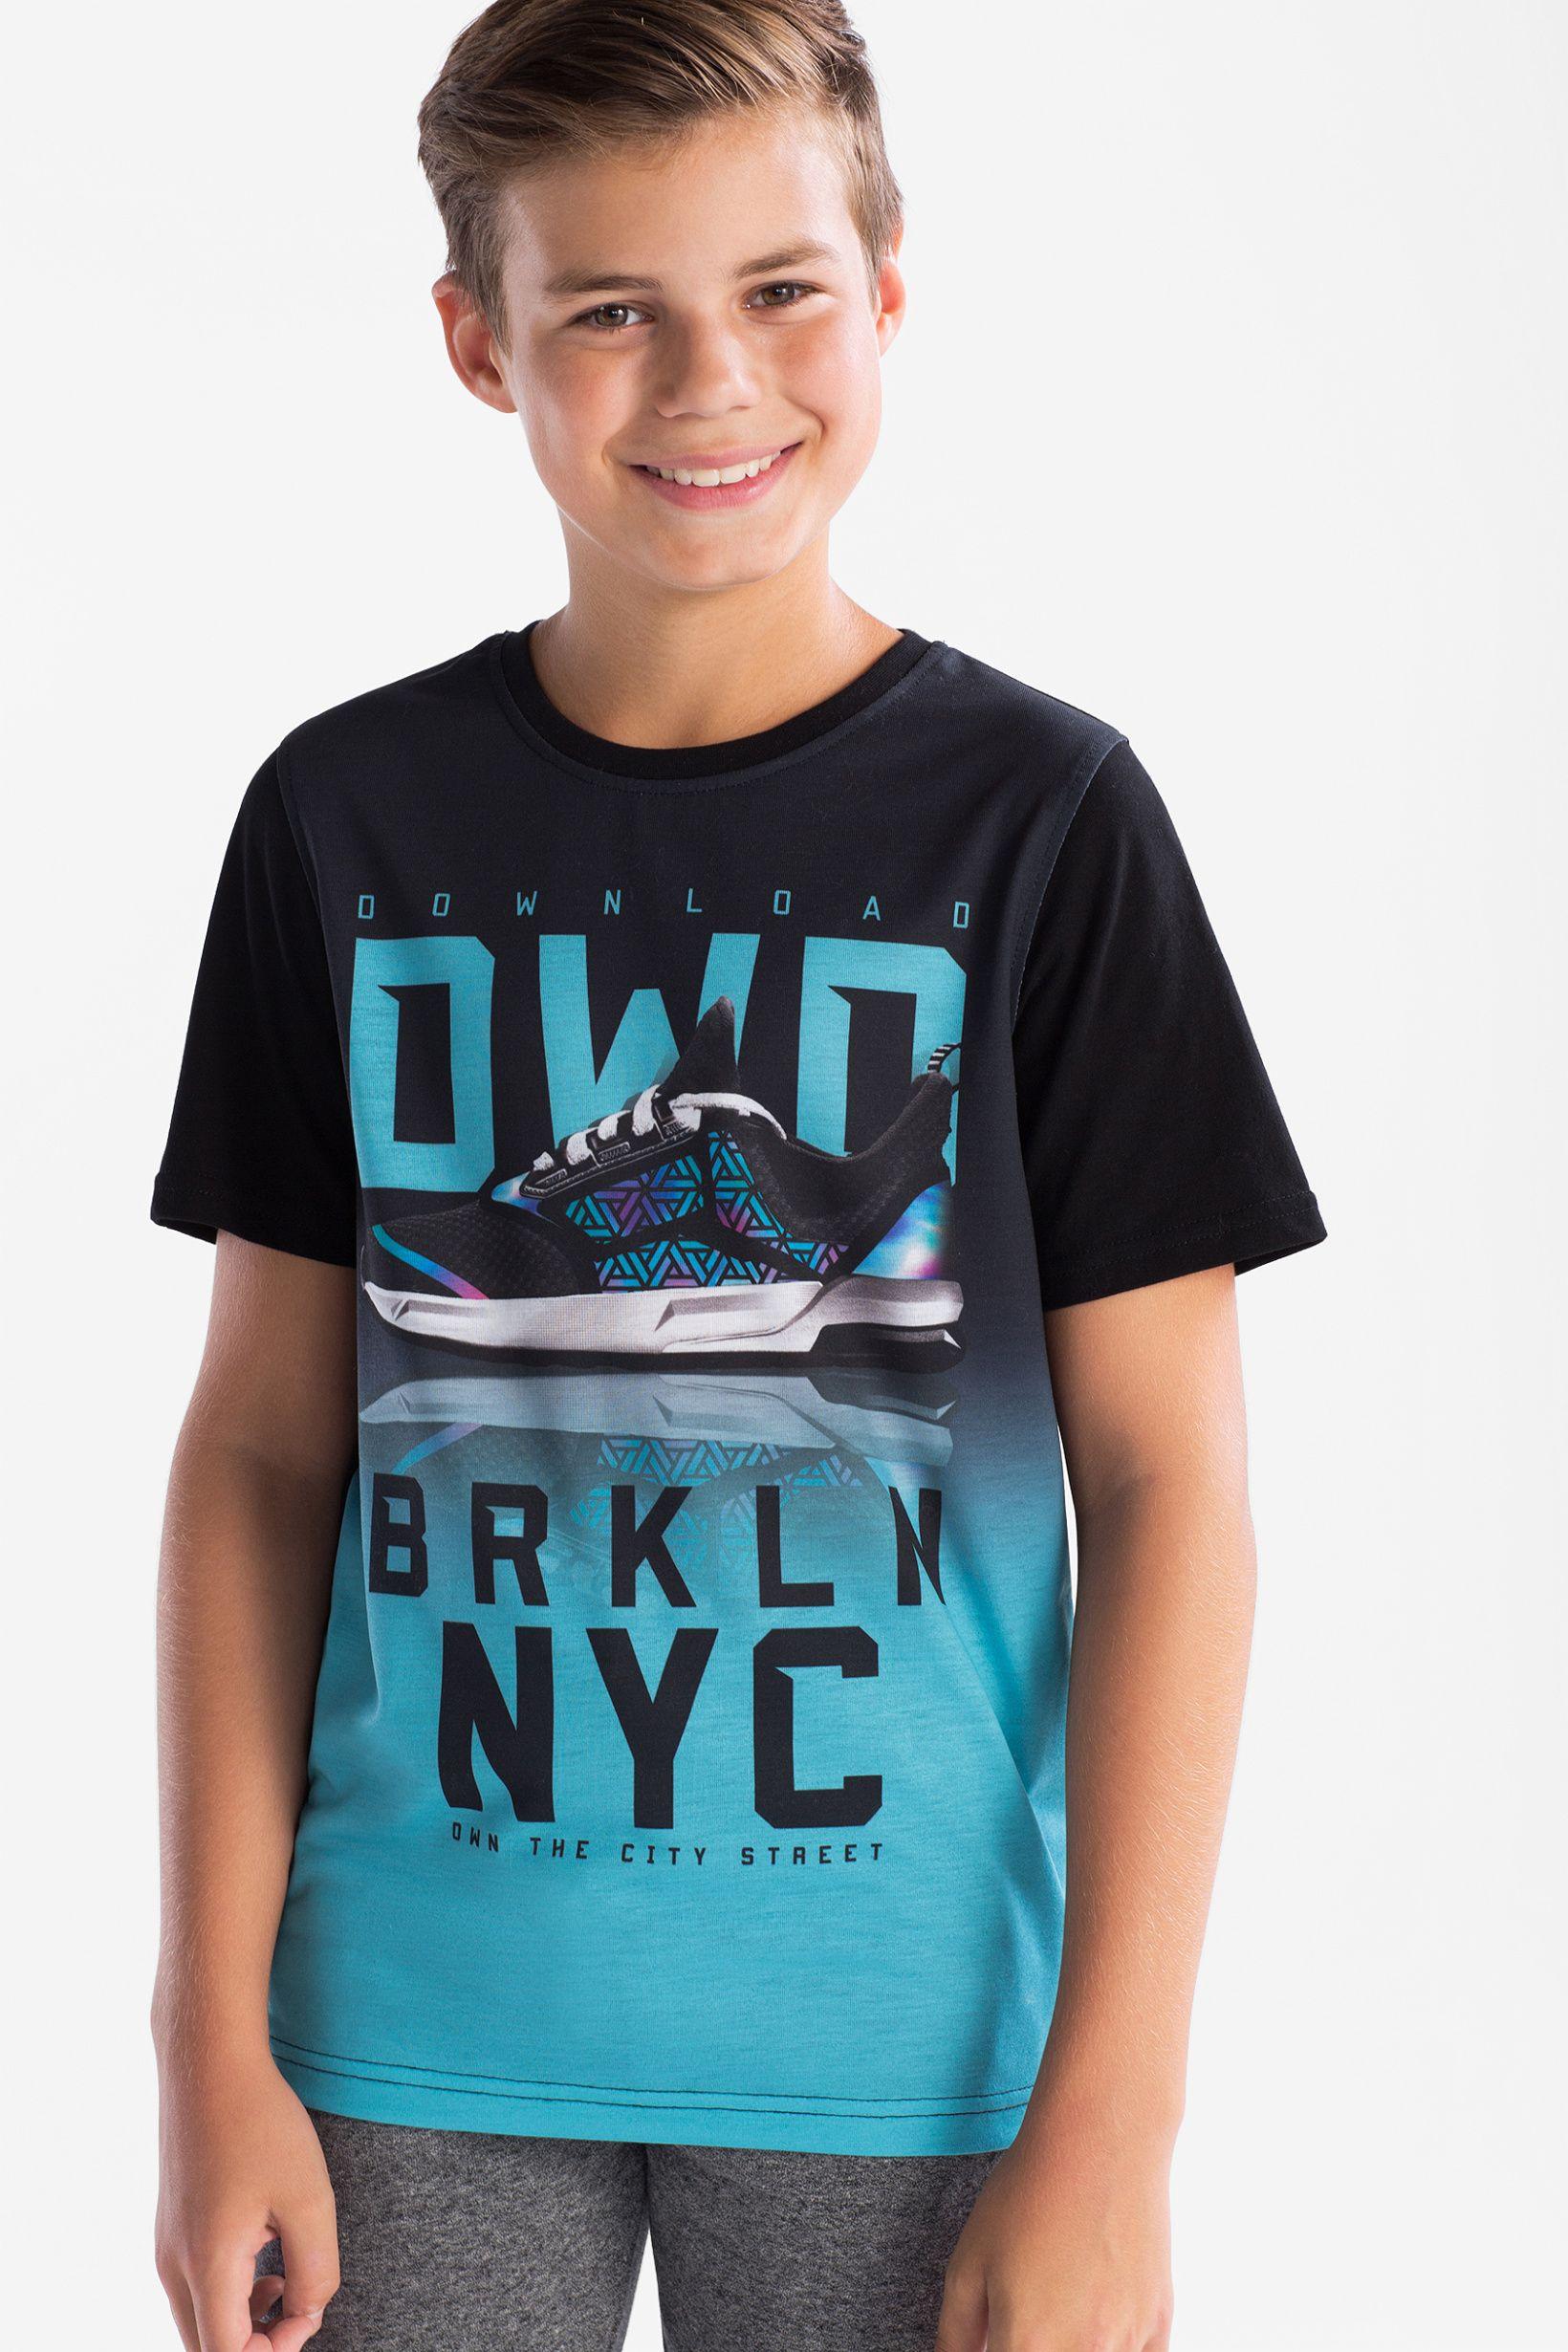 8979d8807da Camiseta | C&A Camisetas Hombre Estampadas, Camisetas Niño, Ropa Para  Adolescentes, Mangas Largas